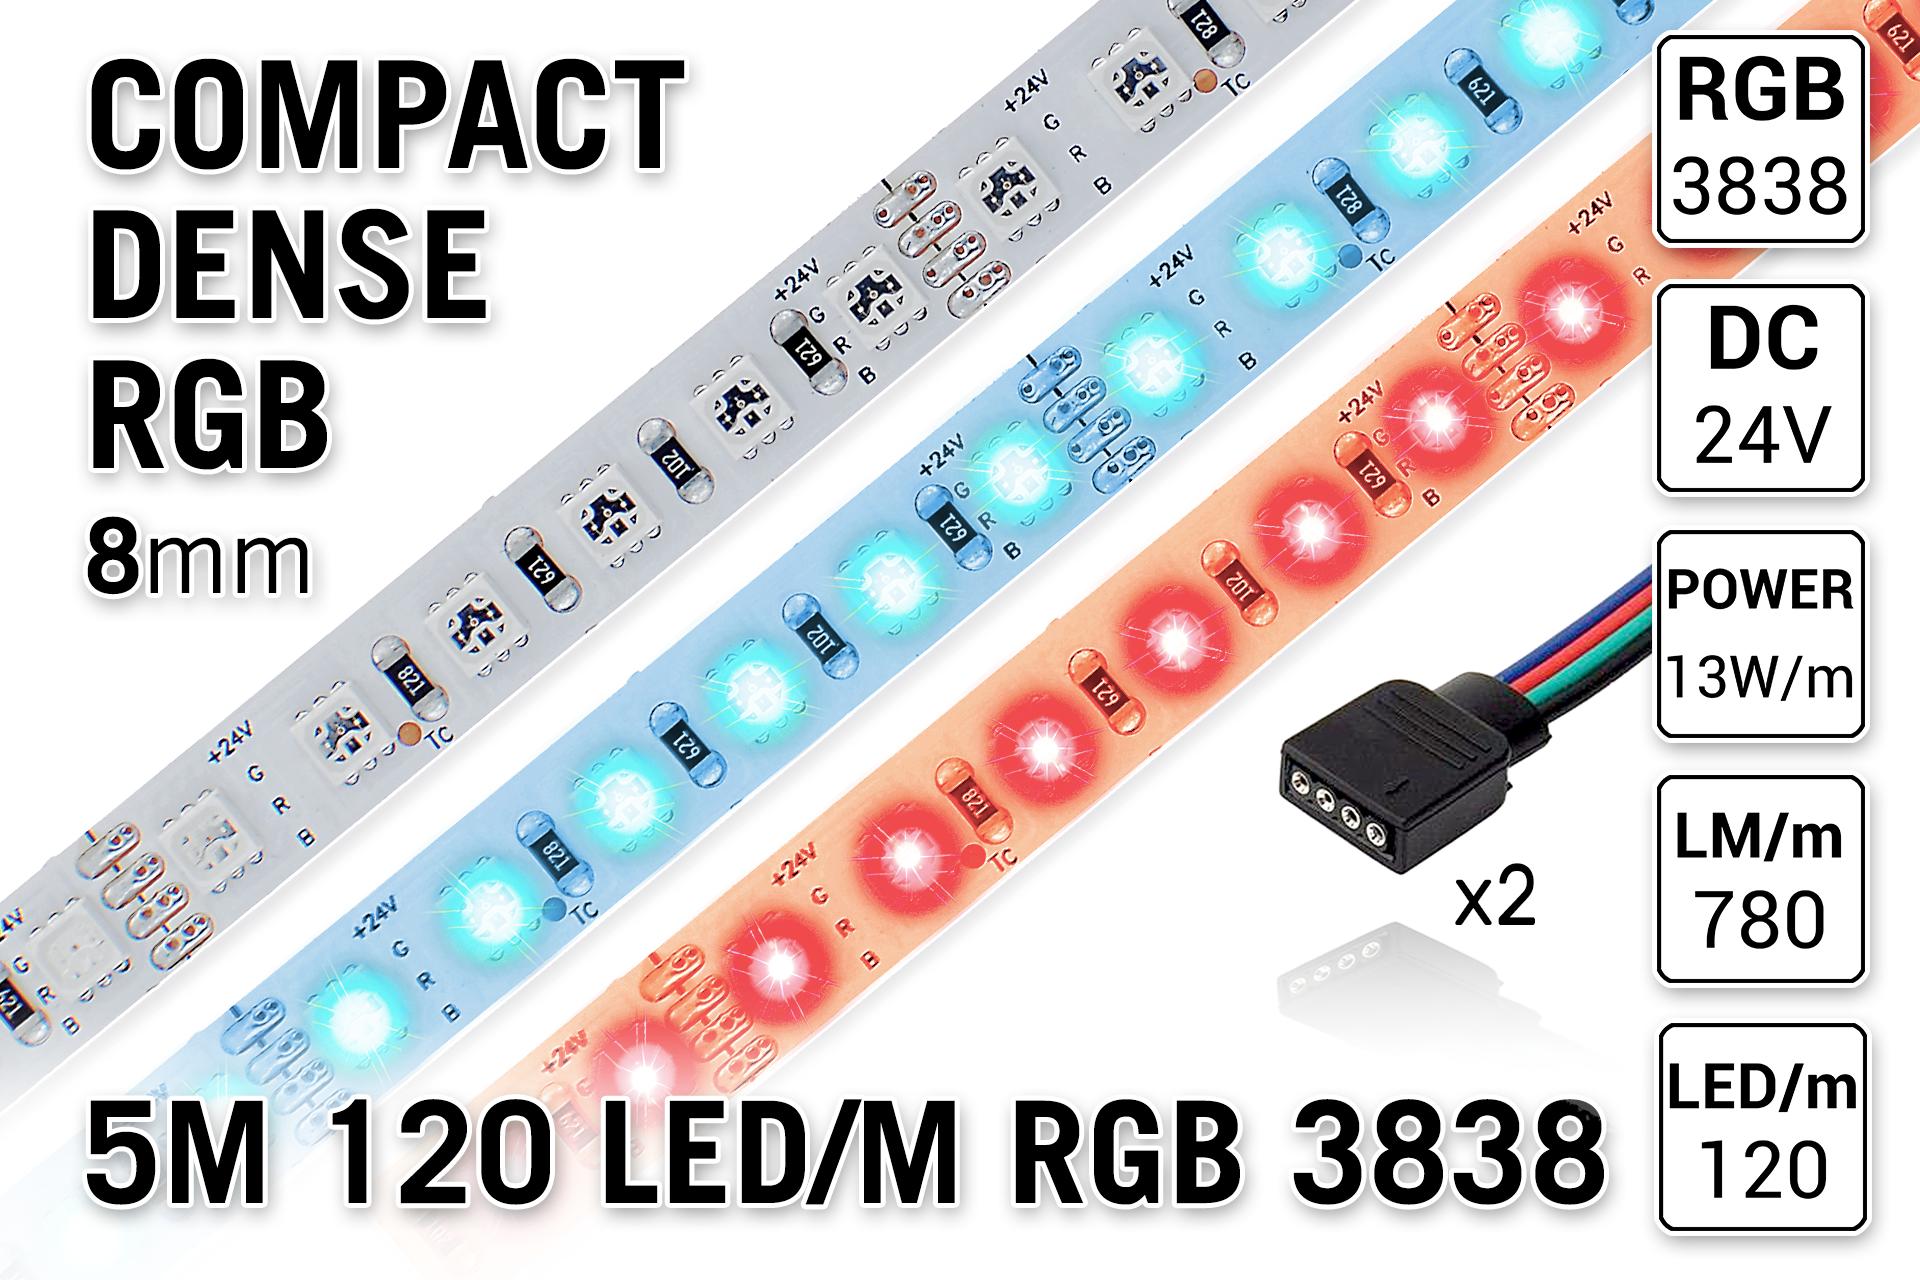 PRO LINE Compact RGB Kleur Led Strip | 5m 120 Leds pm Type 3838 24V - Losse Strip